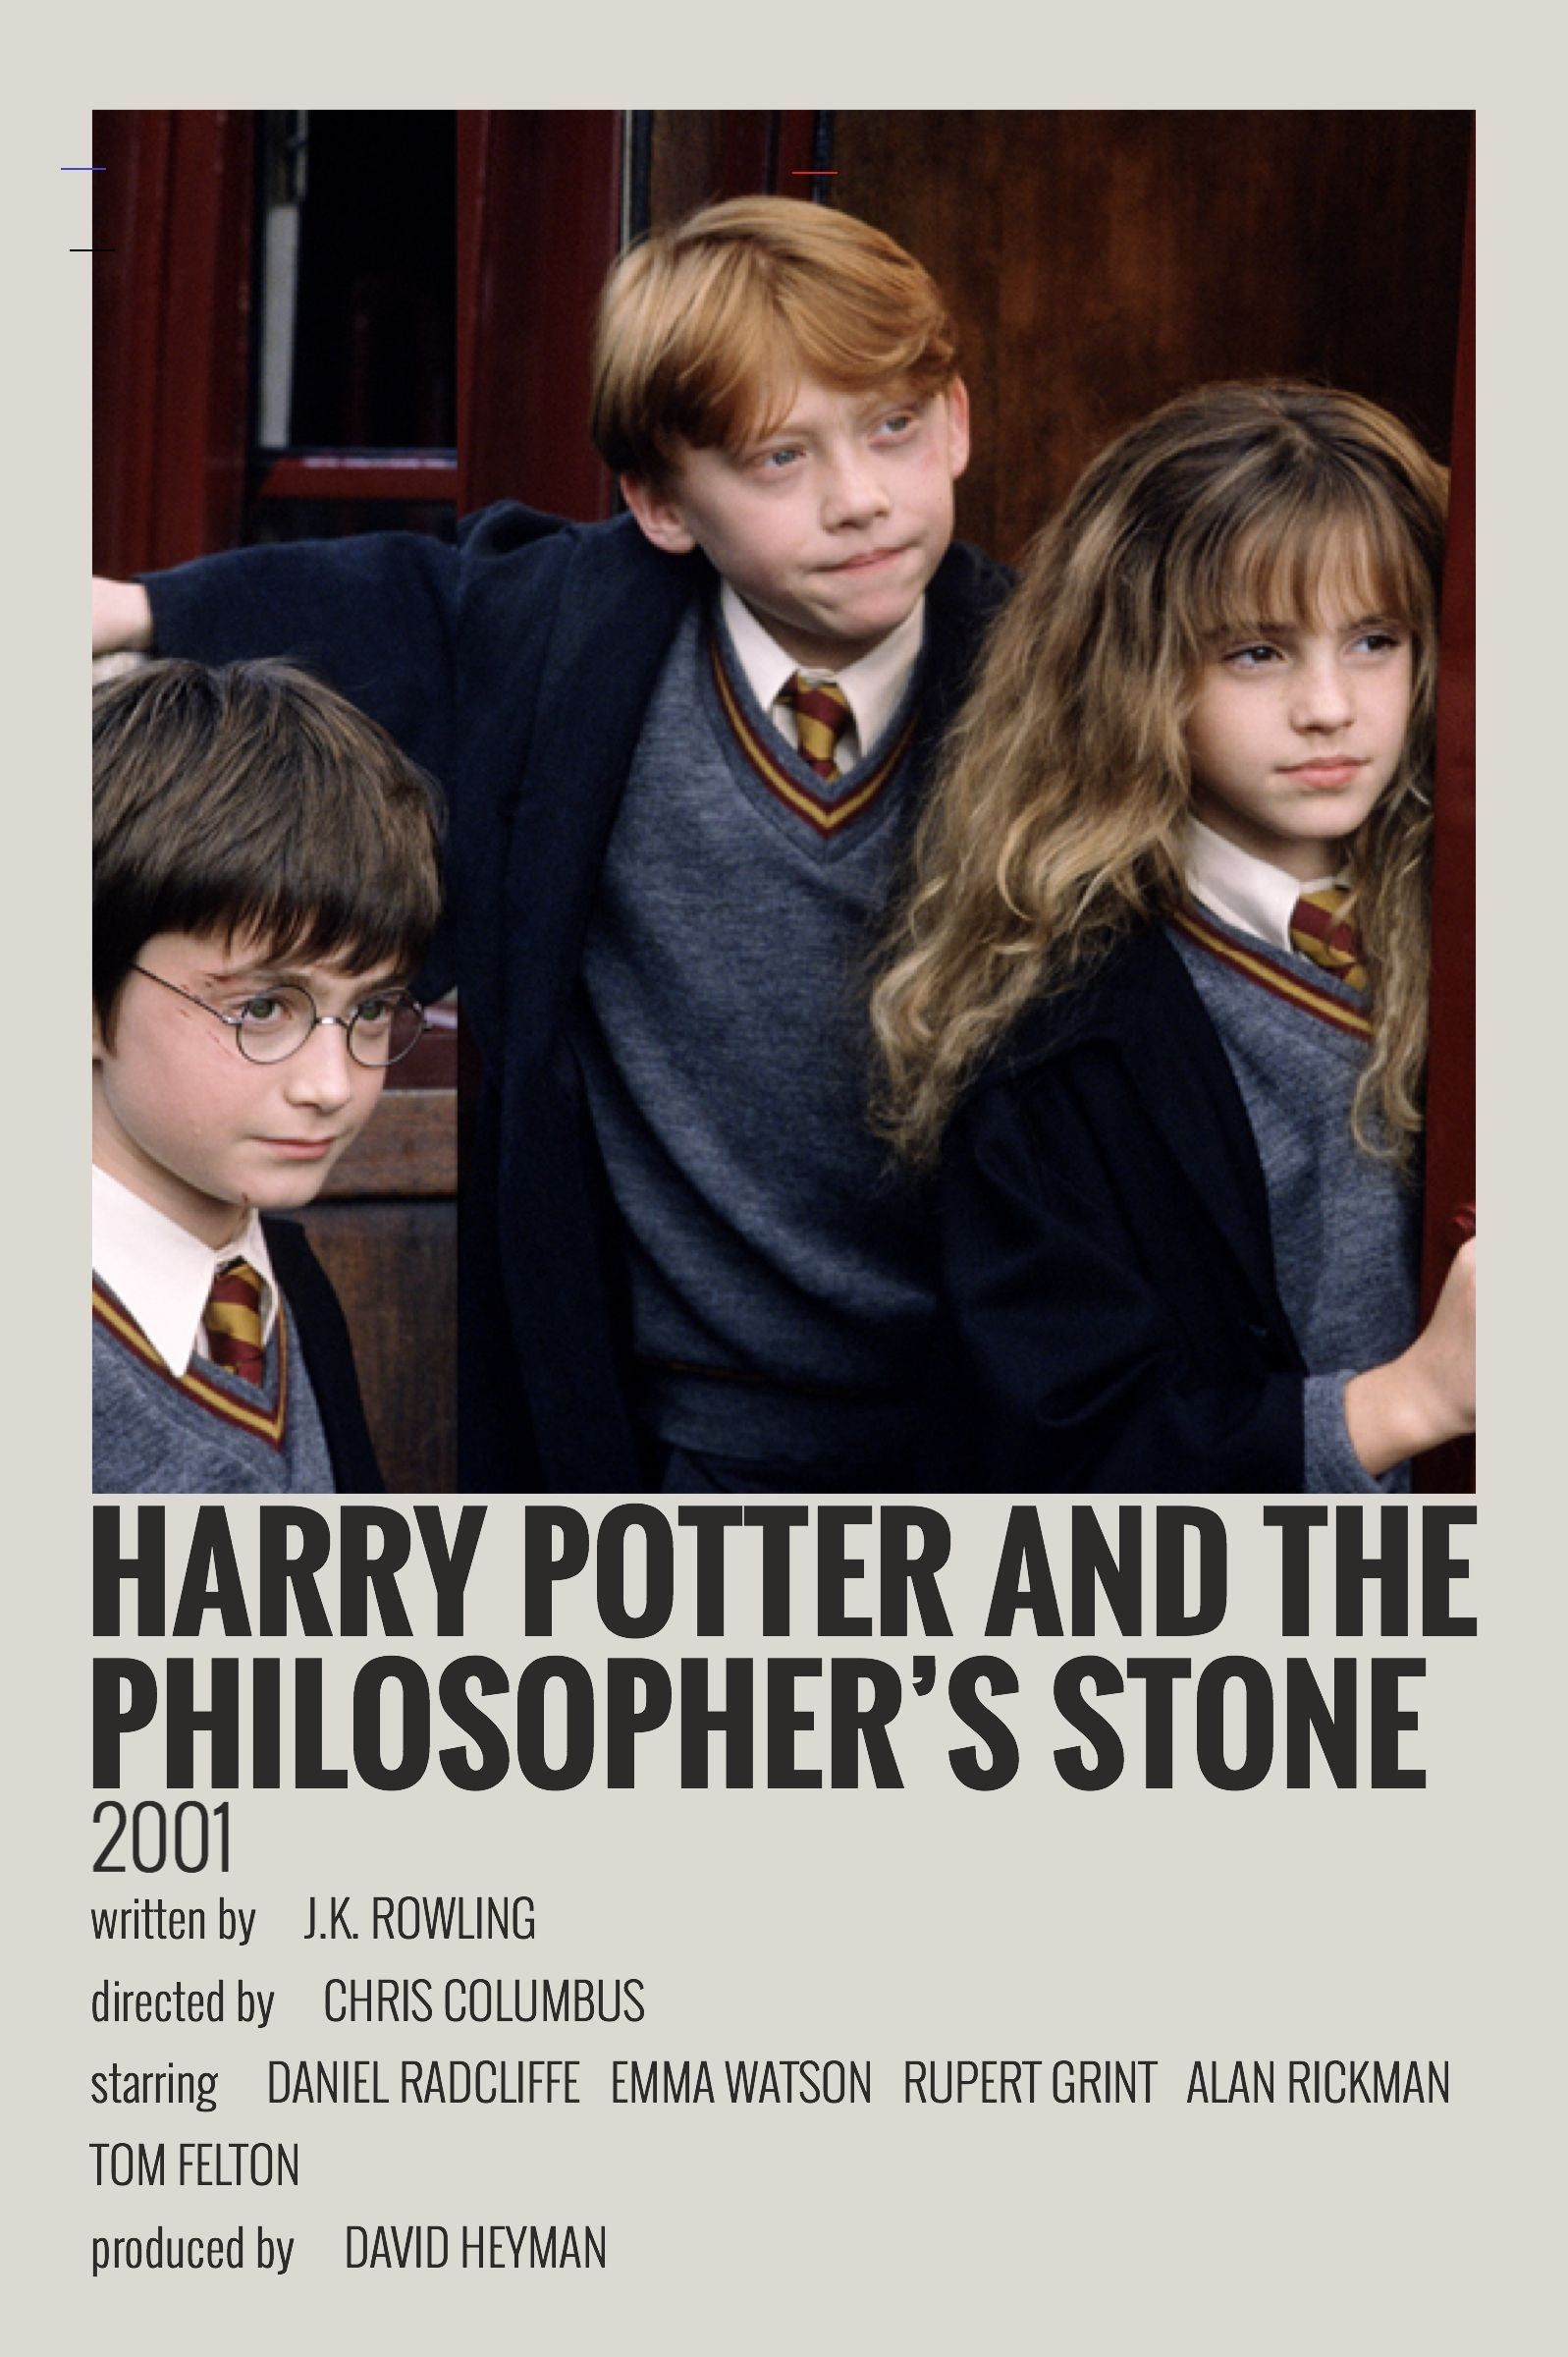 Alternative Minimalist Movie Show Polaroid Poster Harry Potter And The Philosophers Stone Film Posters Minimalist Indie Movie Posters Movie Posters Minimalist